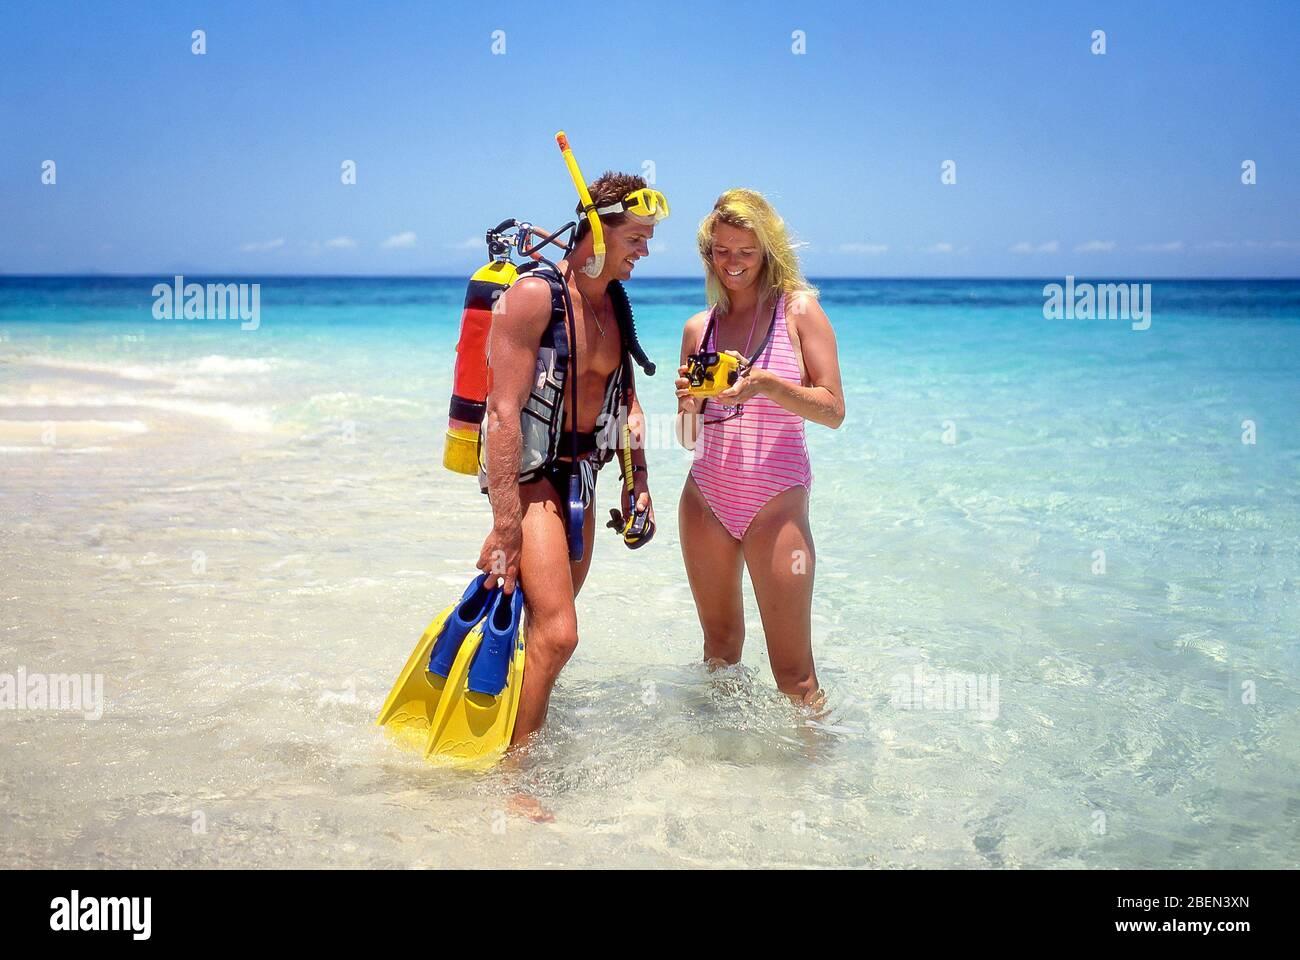 Couple scuba diving, Kuda Bandos, Kaafu Atoll, Republic of Maldives Stock Photo